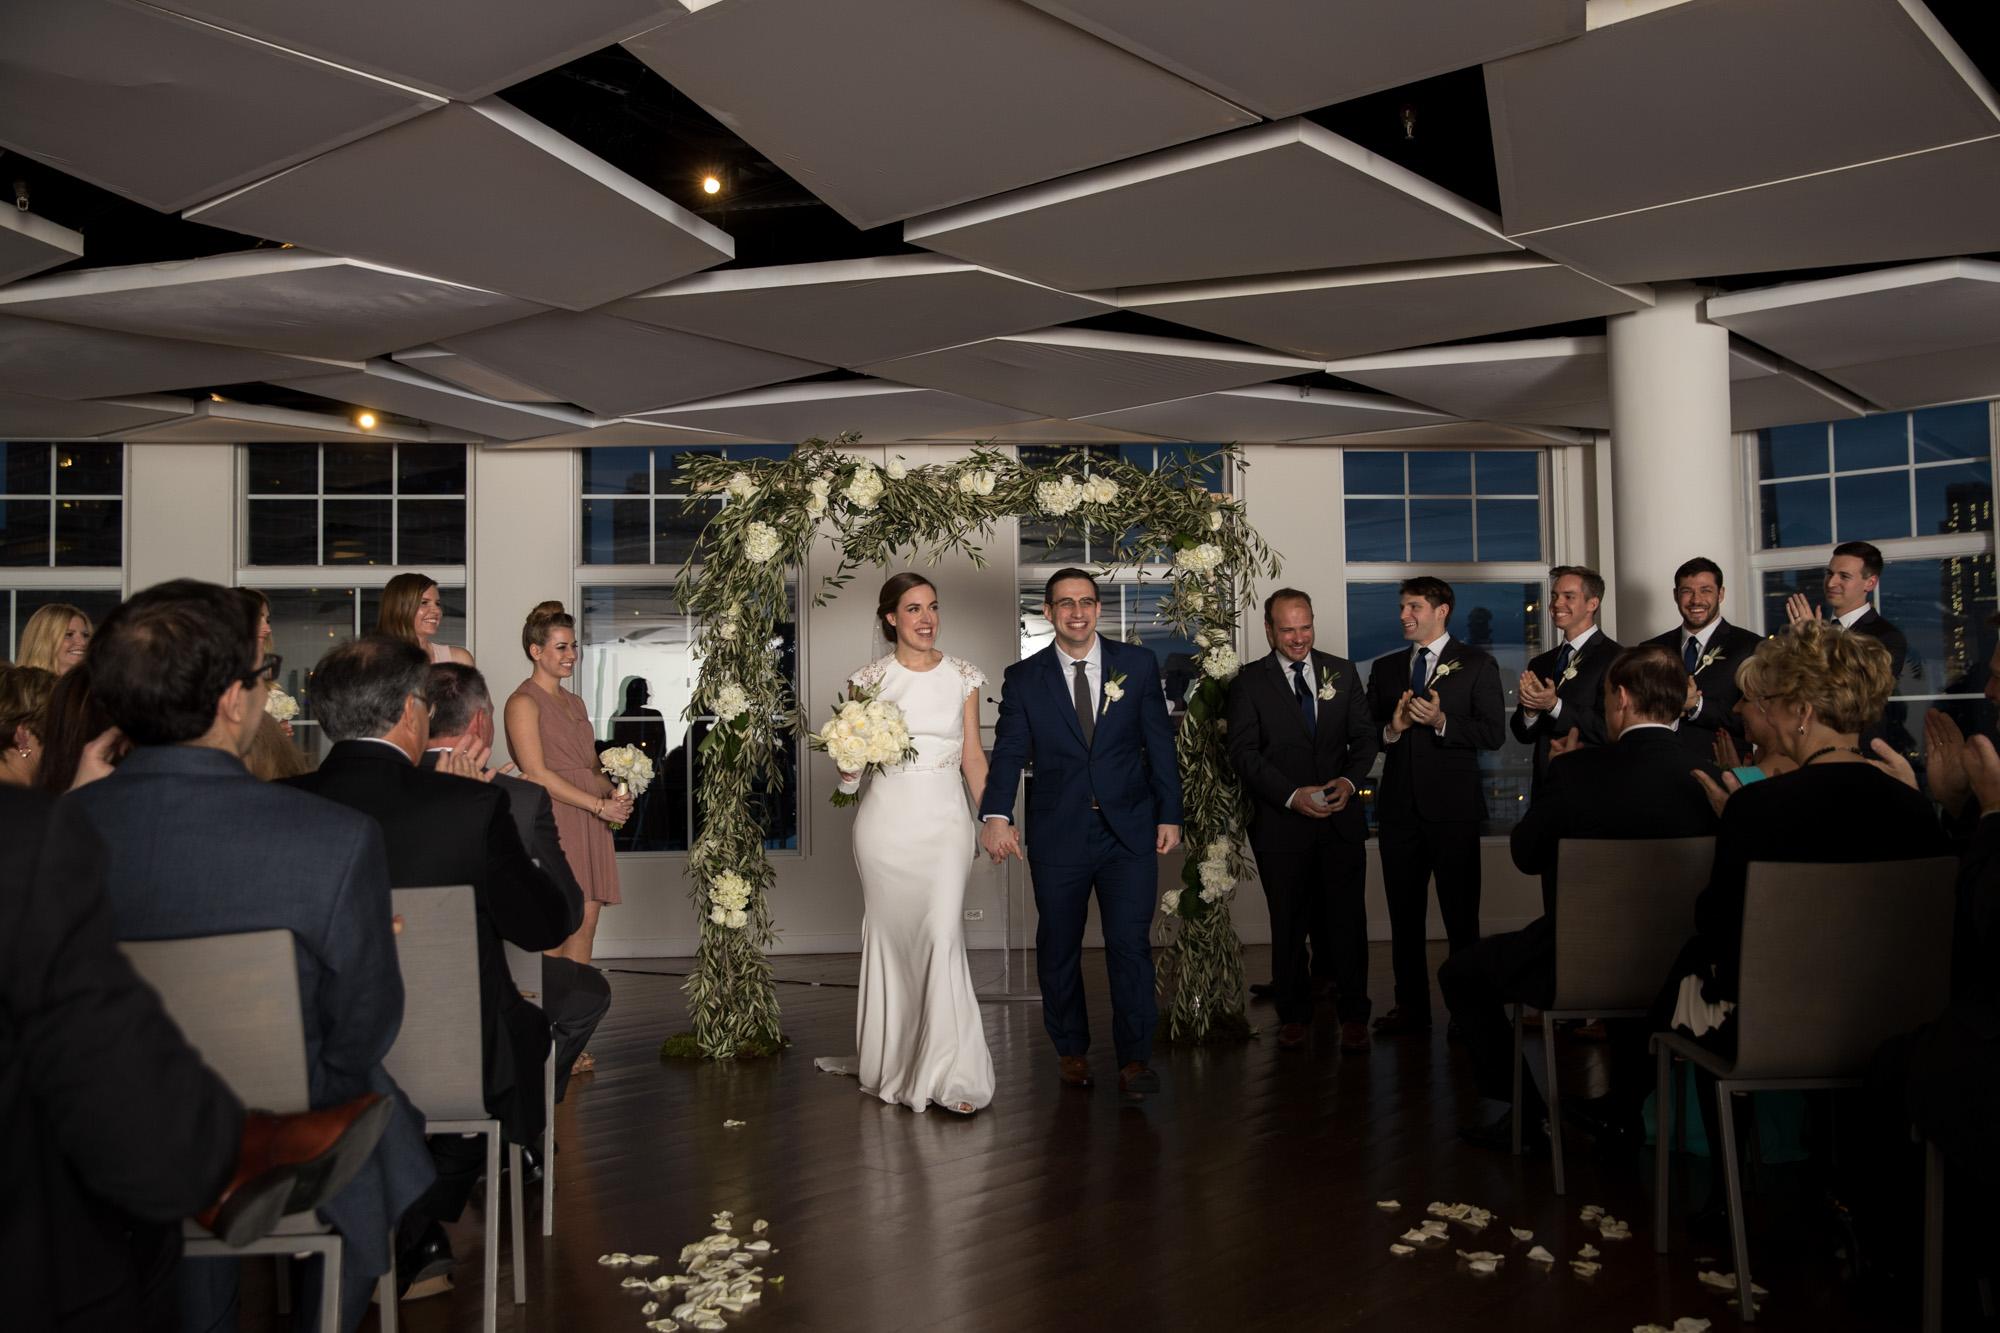 nj-wedding-photographer-maritime-parc-maria-david-41.jpg